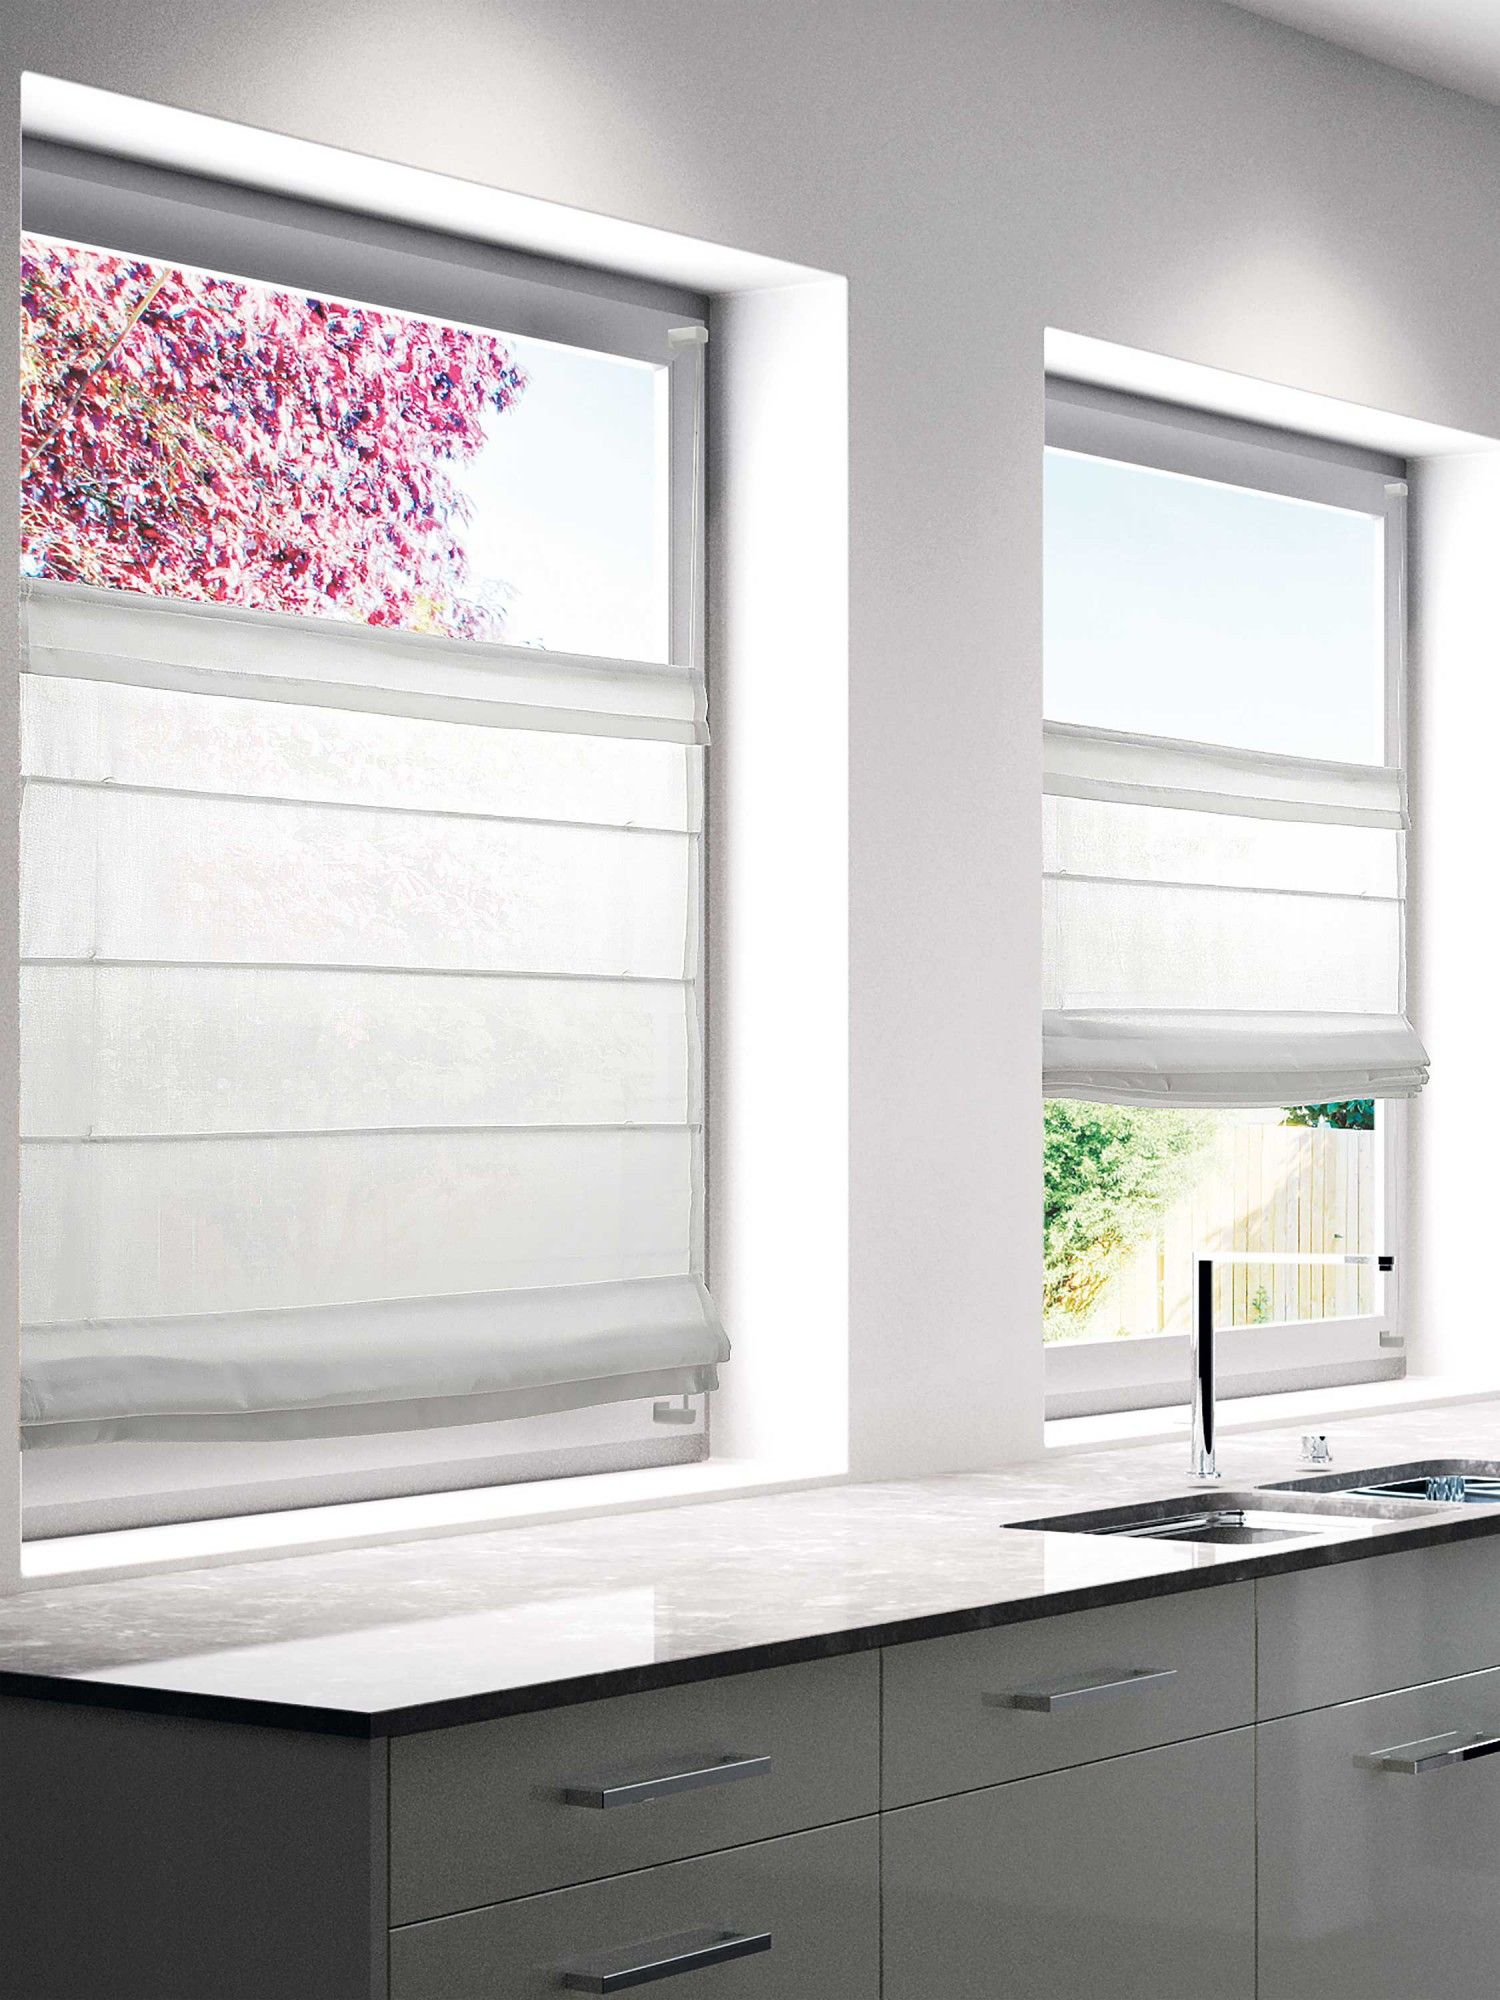 Faltrollo MOOD weiß 16x16cm (BH 16x16 cm)  Küchenfenster